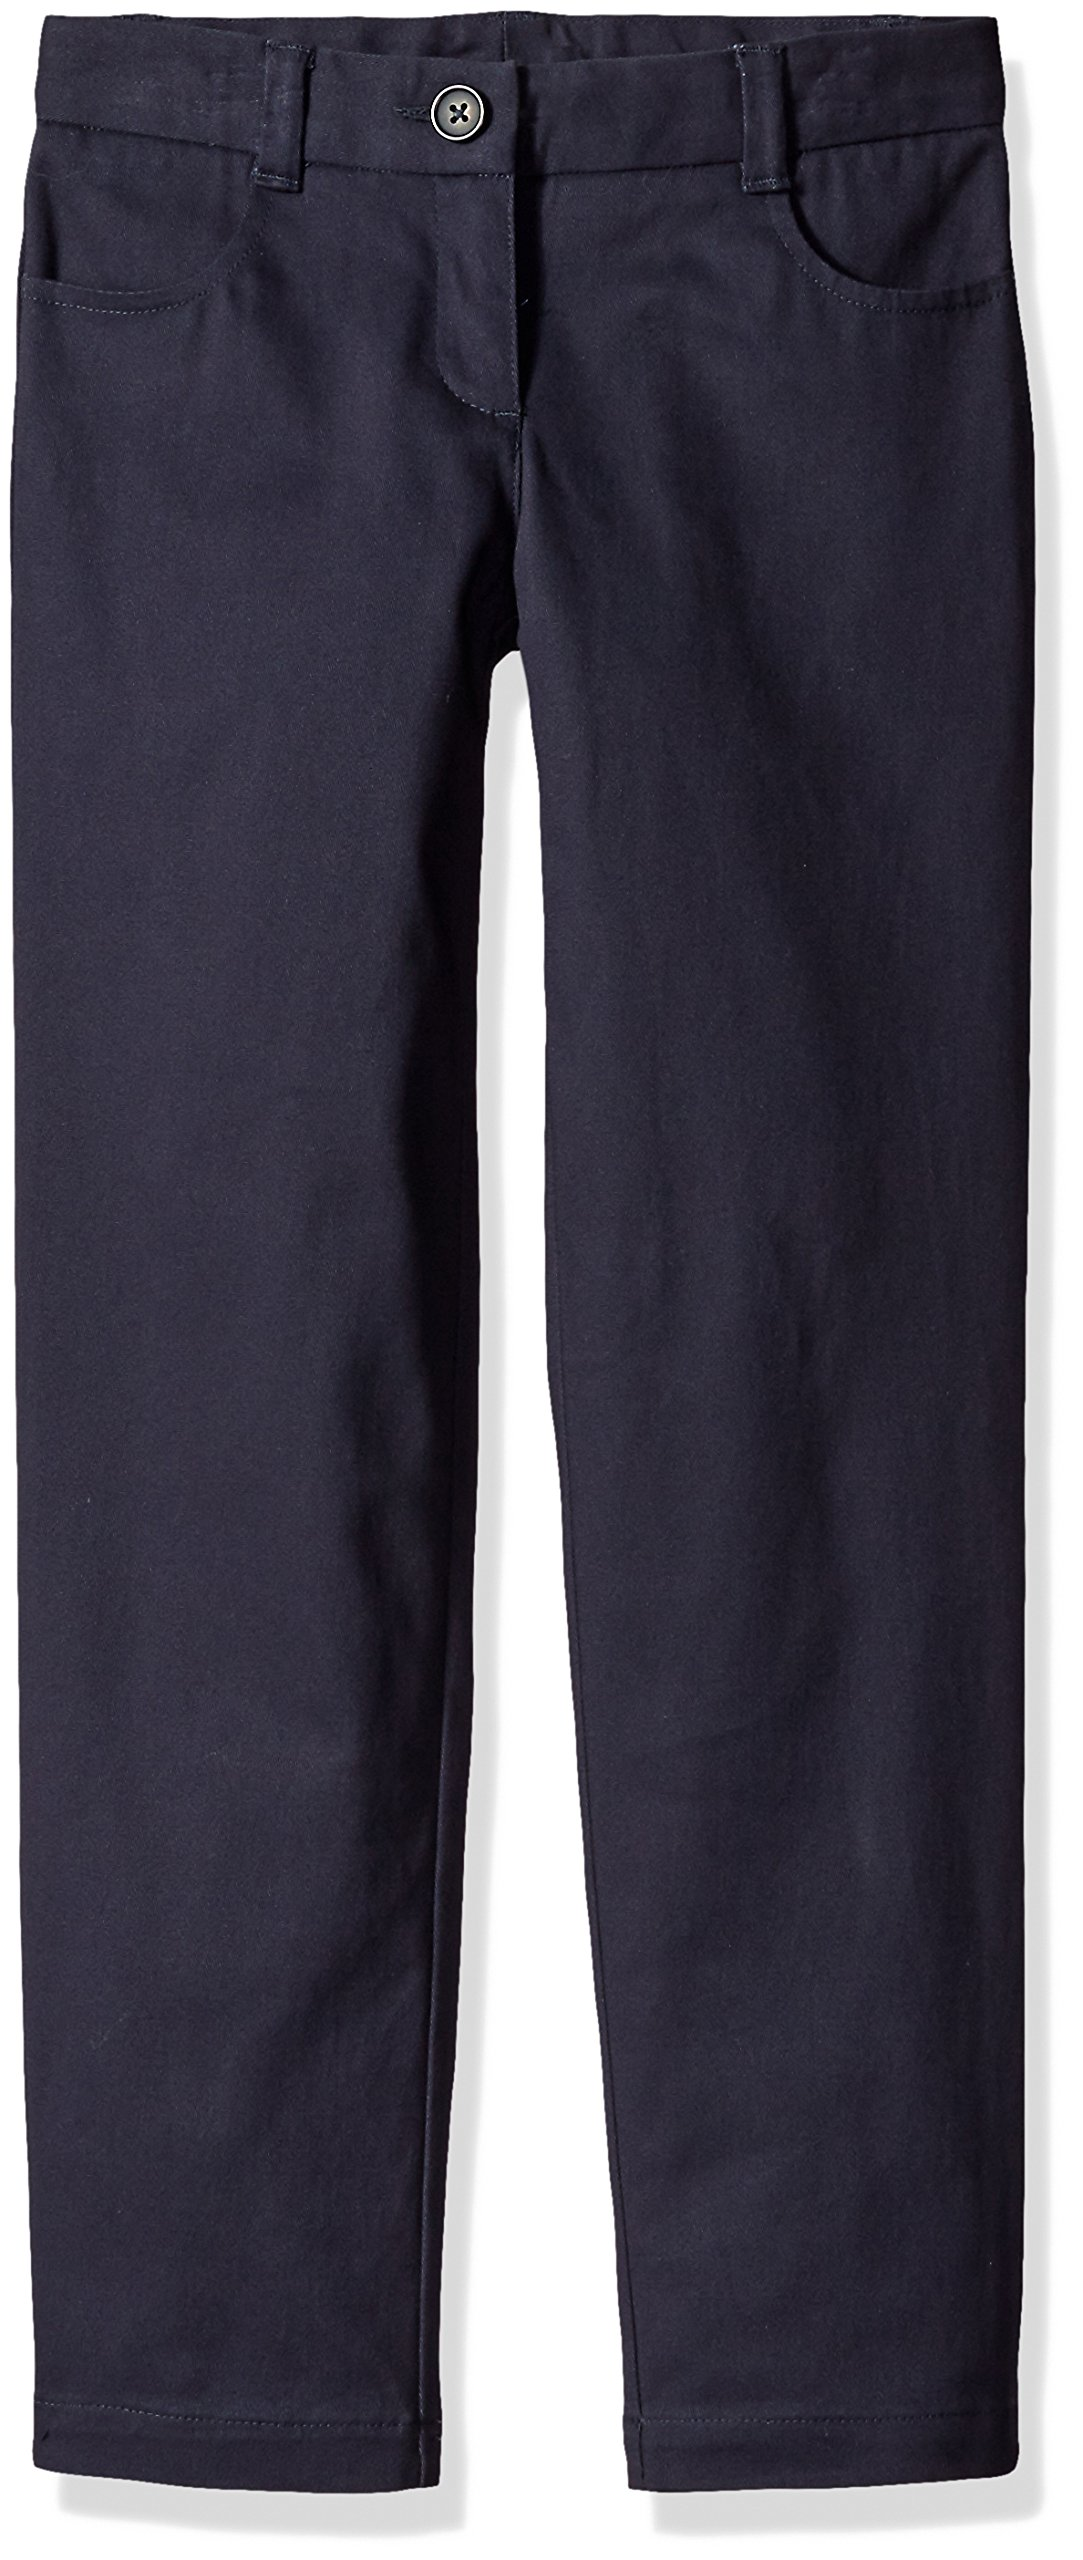 Dockers Big Girls' Uniform Skinny Pant, Navy, 14